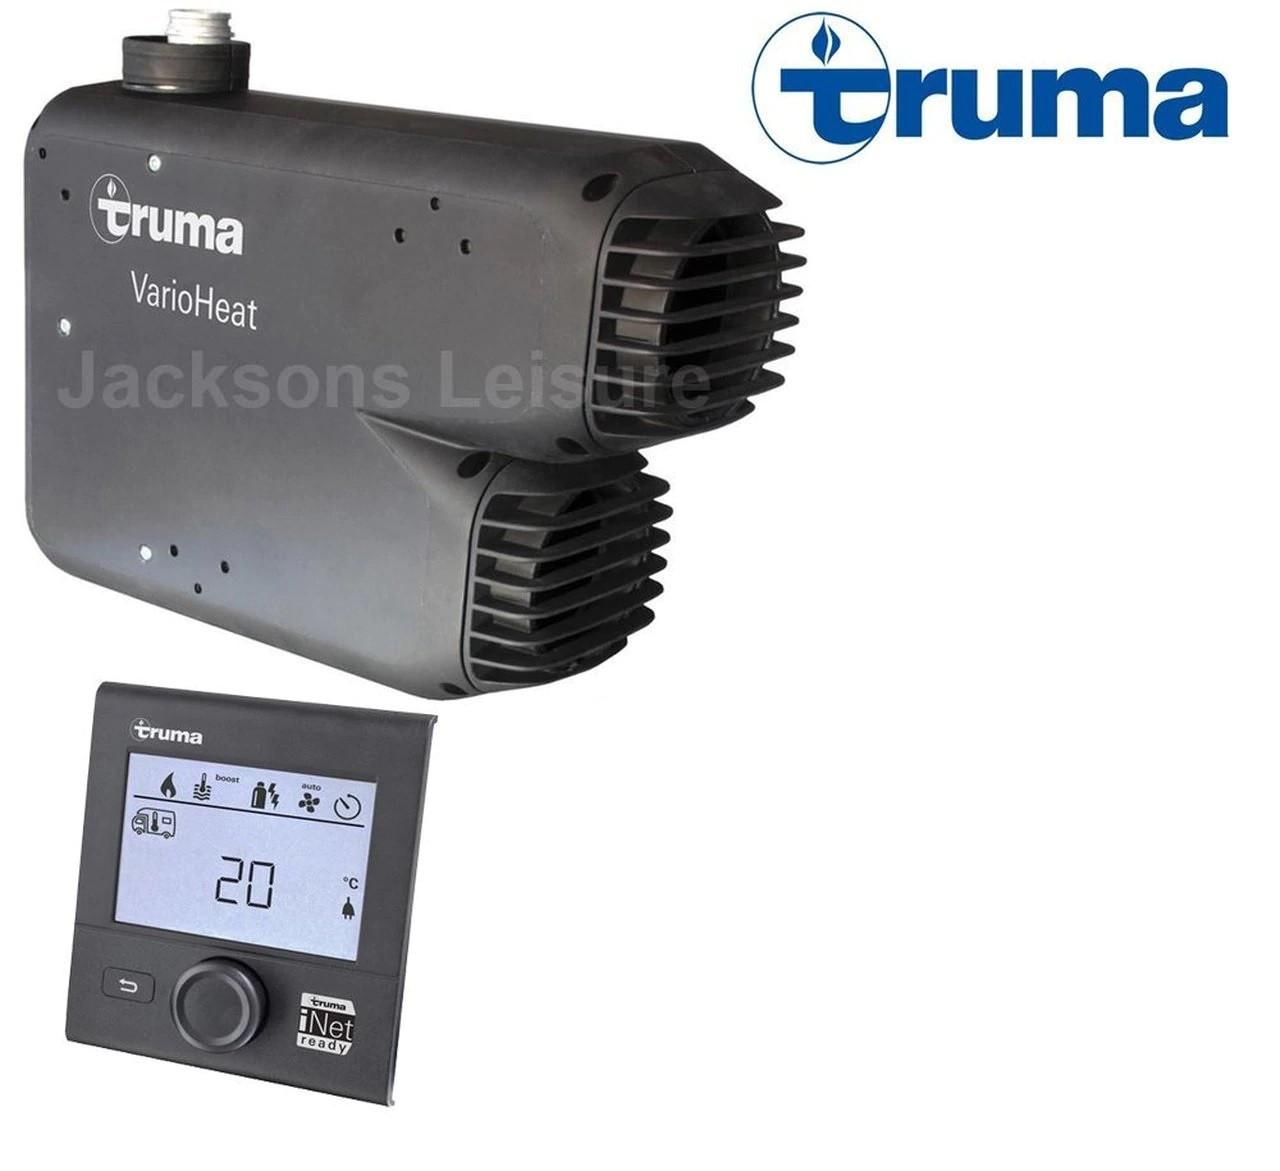 Truma Variaheat with digital control panel